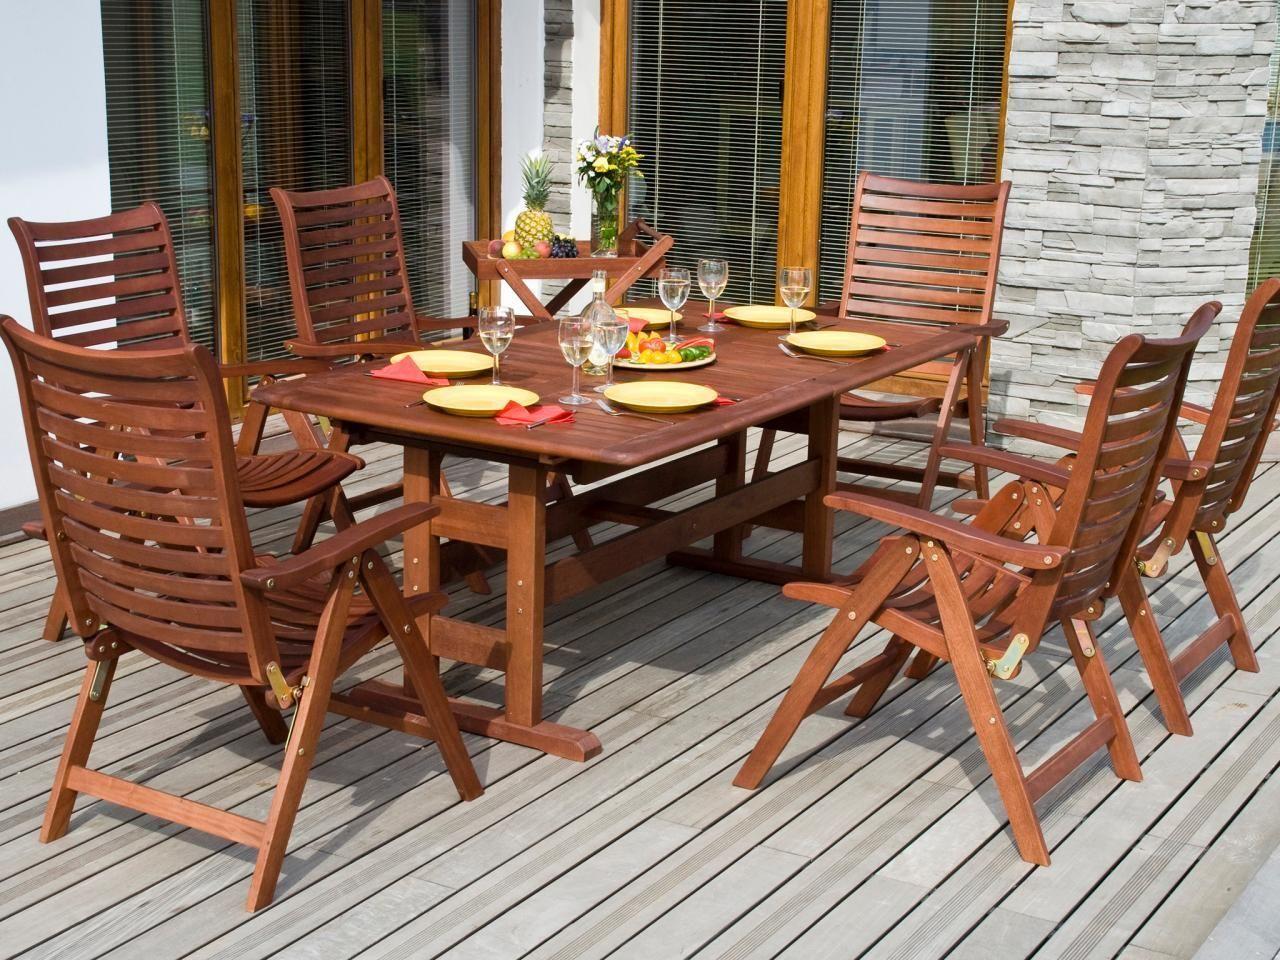 15 teak patio furniture ideas and how to maintenance it cheap rh pinterest com Teak Table Teak Outdoor Furniture Sale